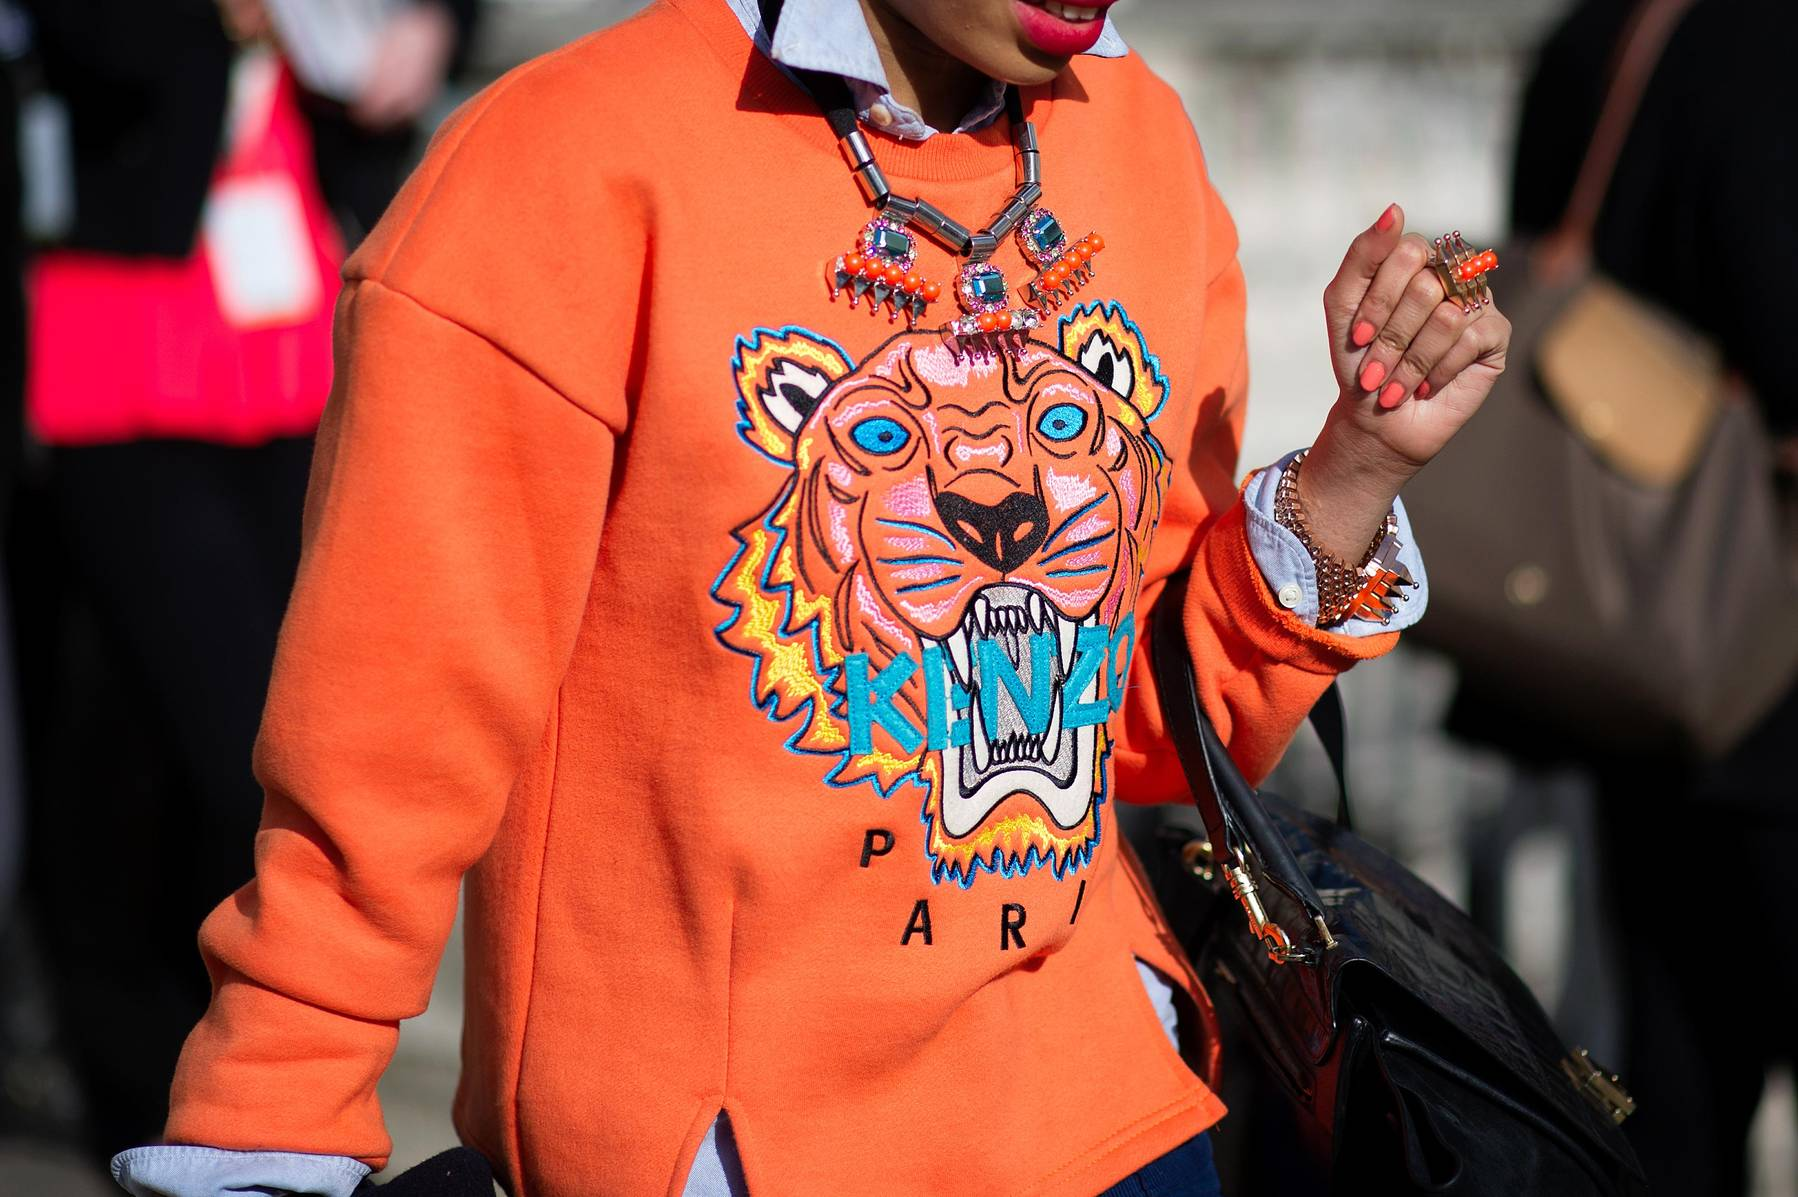 street-style-from-london-fashion-week-feb-2013-tiger